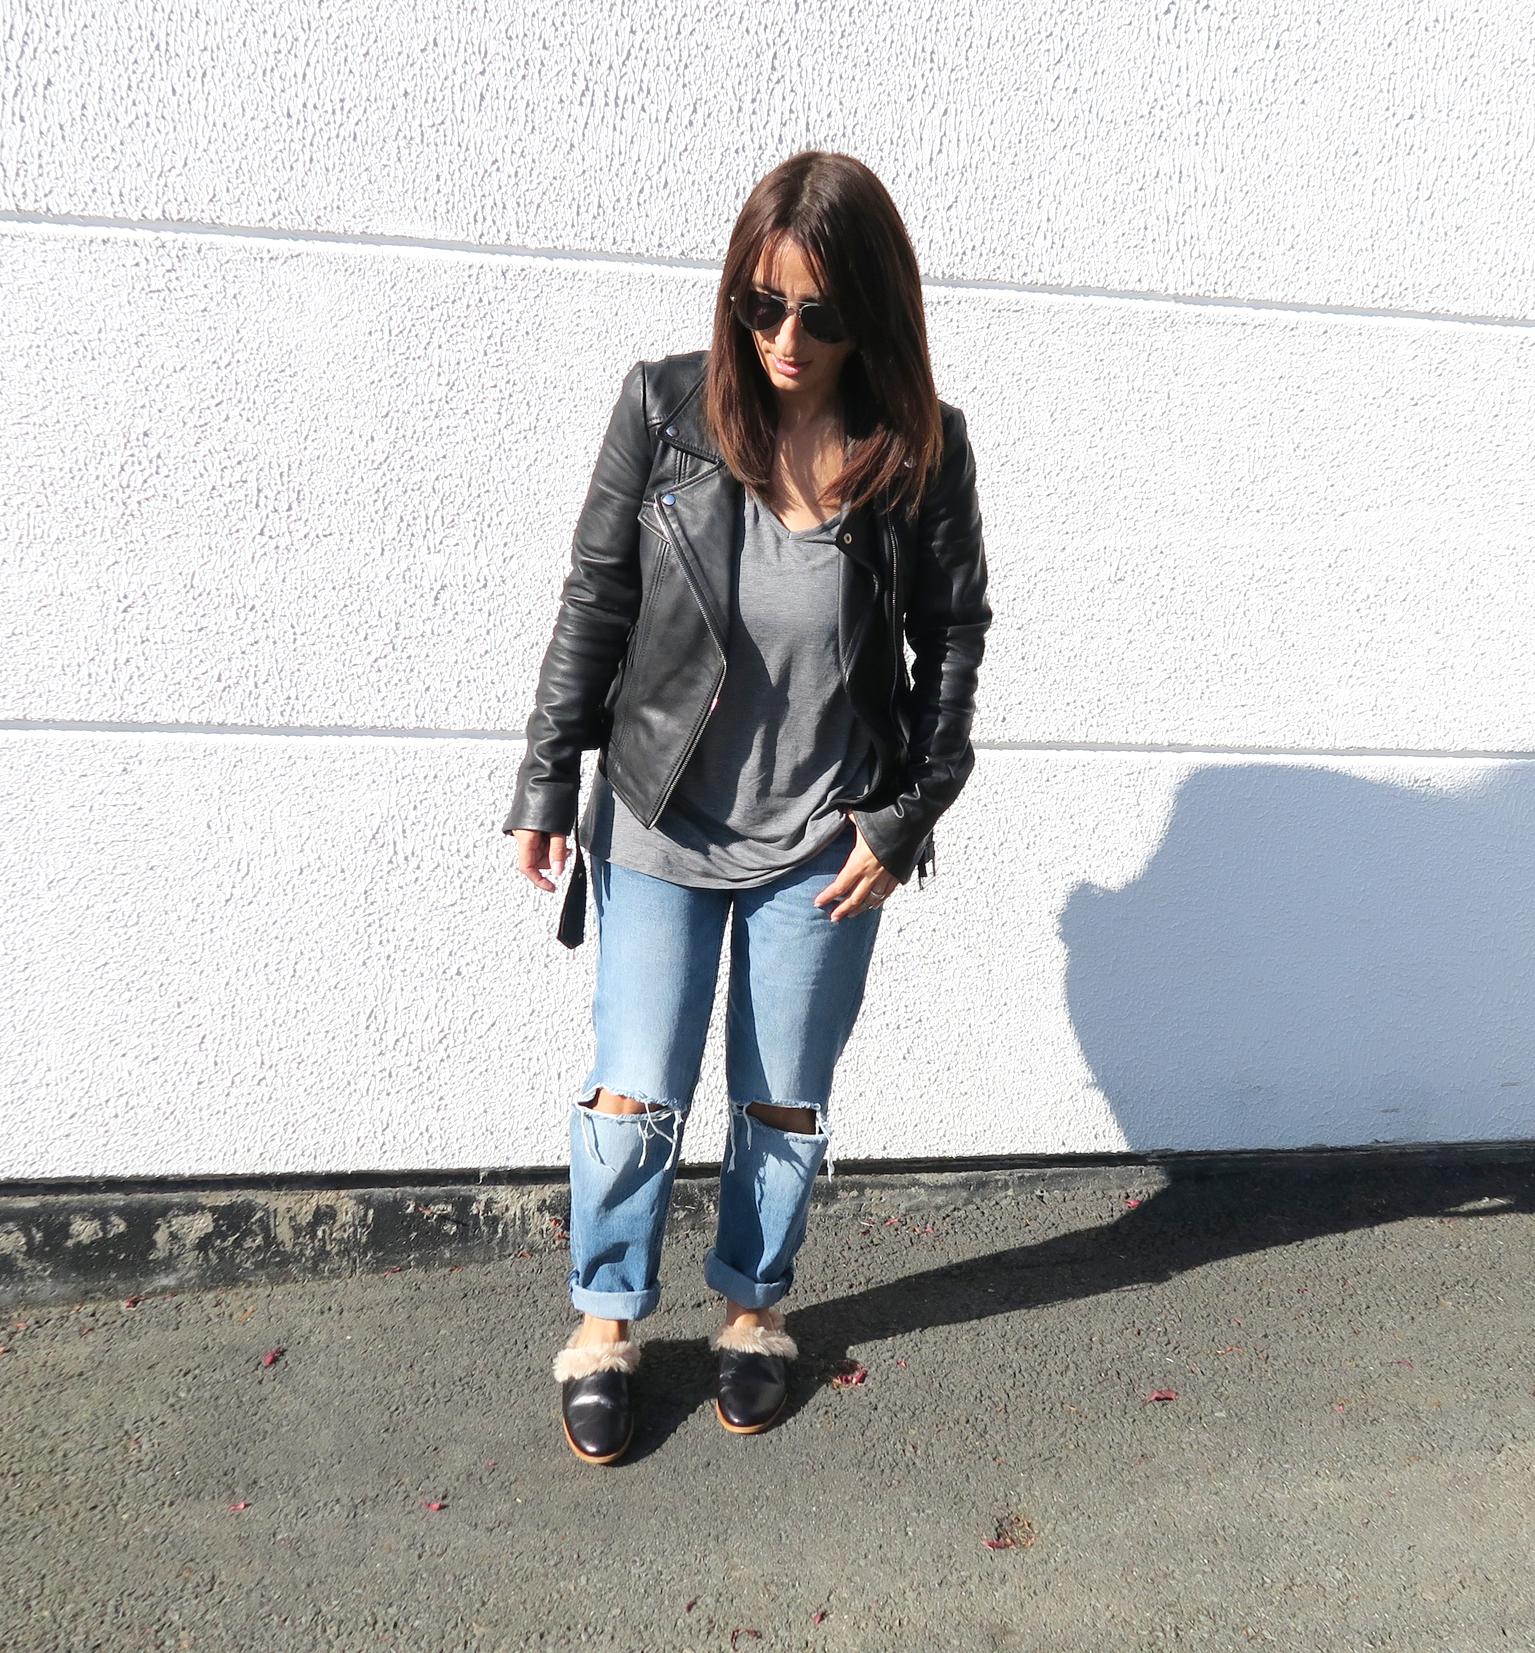 gucci-lookalike-flat-shoes-blogger-bloggerstyle-modesalat-5